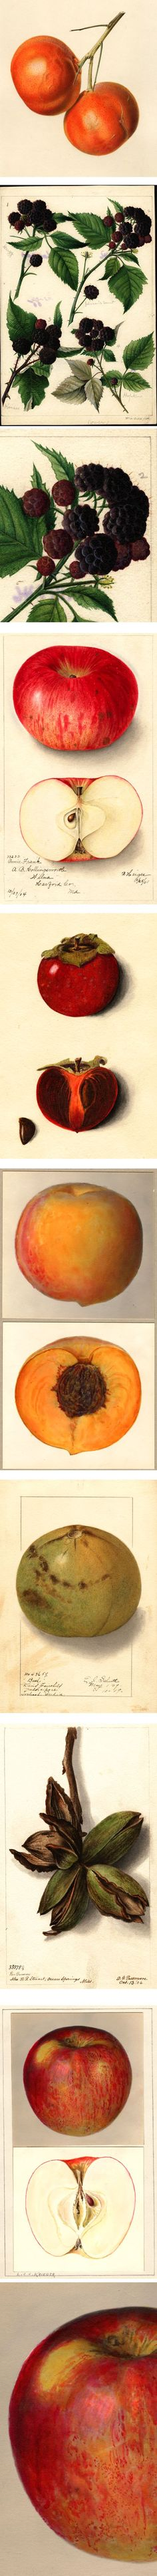 USDA Pomological Watercolor Digital Collection: Charles Steadman, William Henry Prestle, Bertha Heiges, M. Strange, Harriet L. Thompson, Ellen Isham Schutt, Deborah Griscom Passmore, L.C.C. Krieger